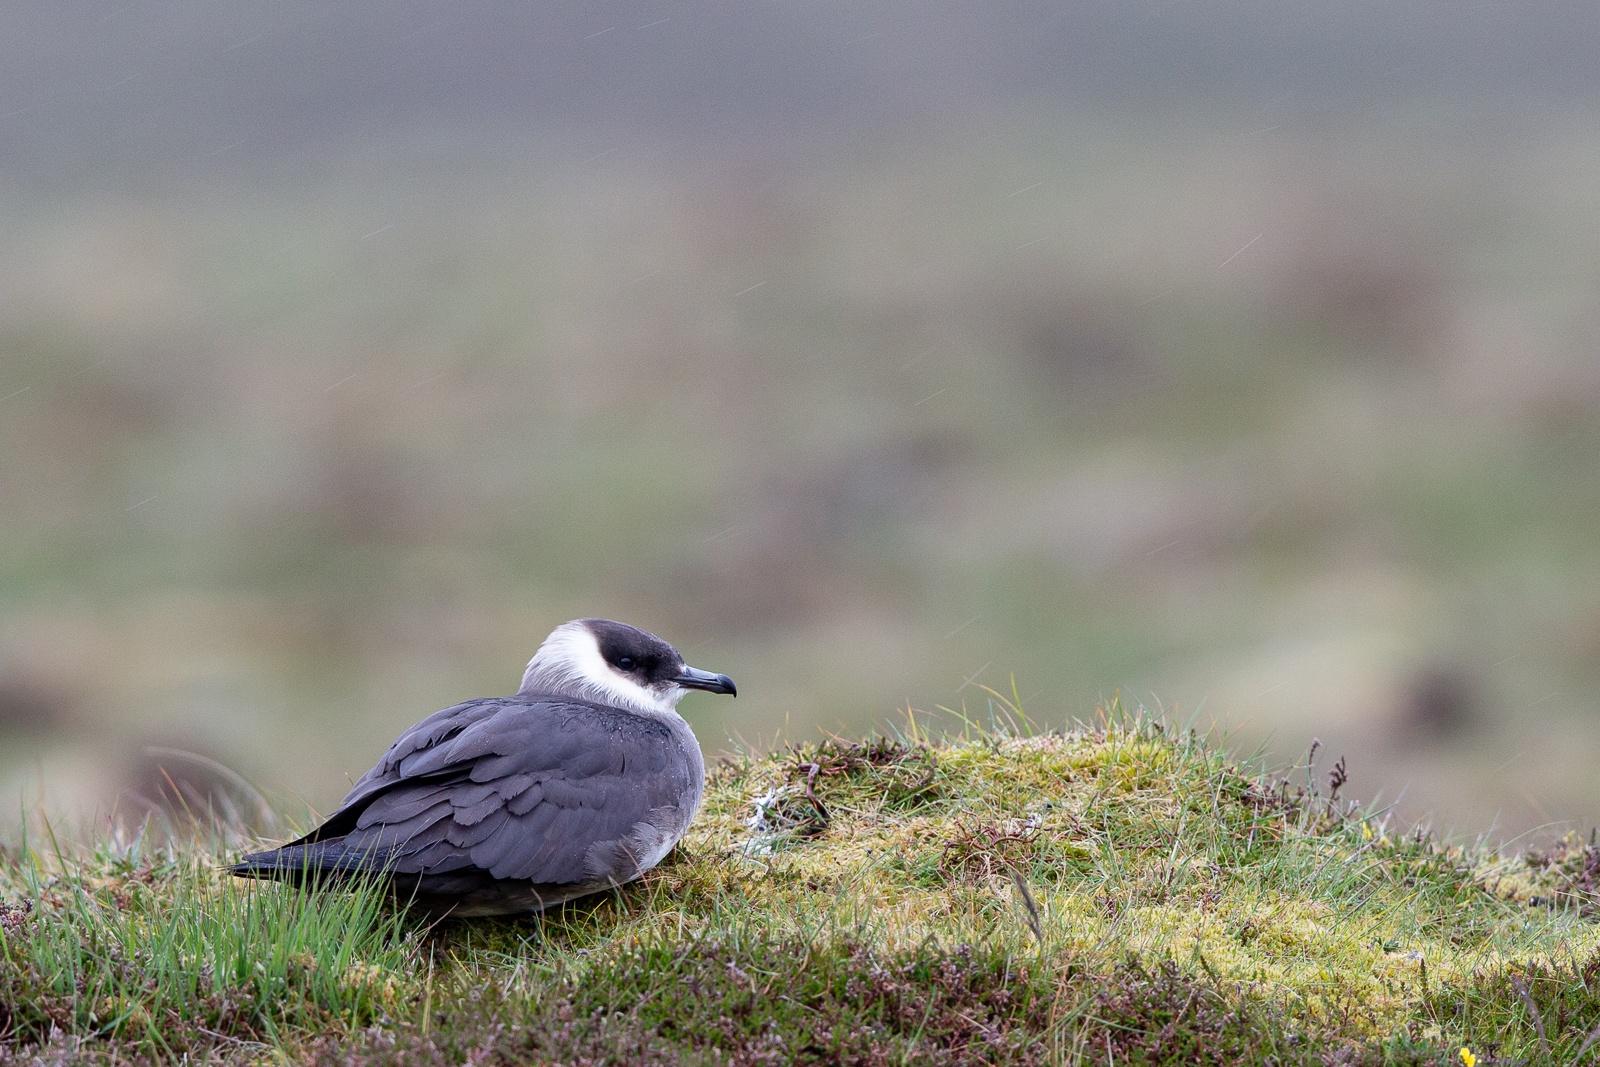 arctic skua in the rain on moorland